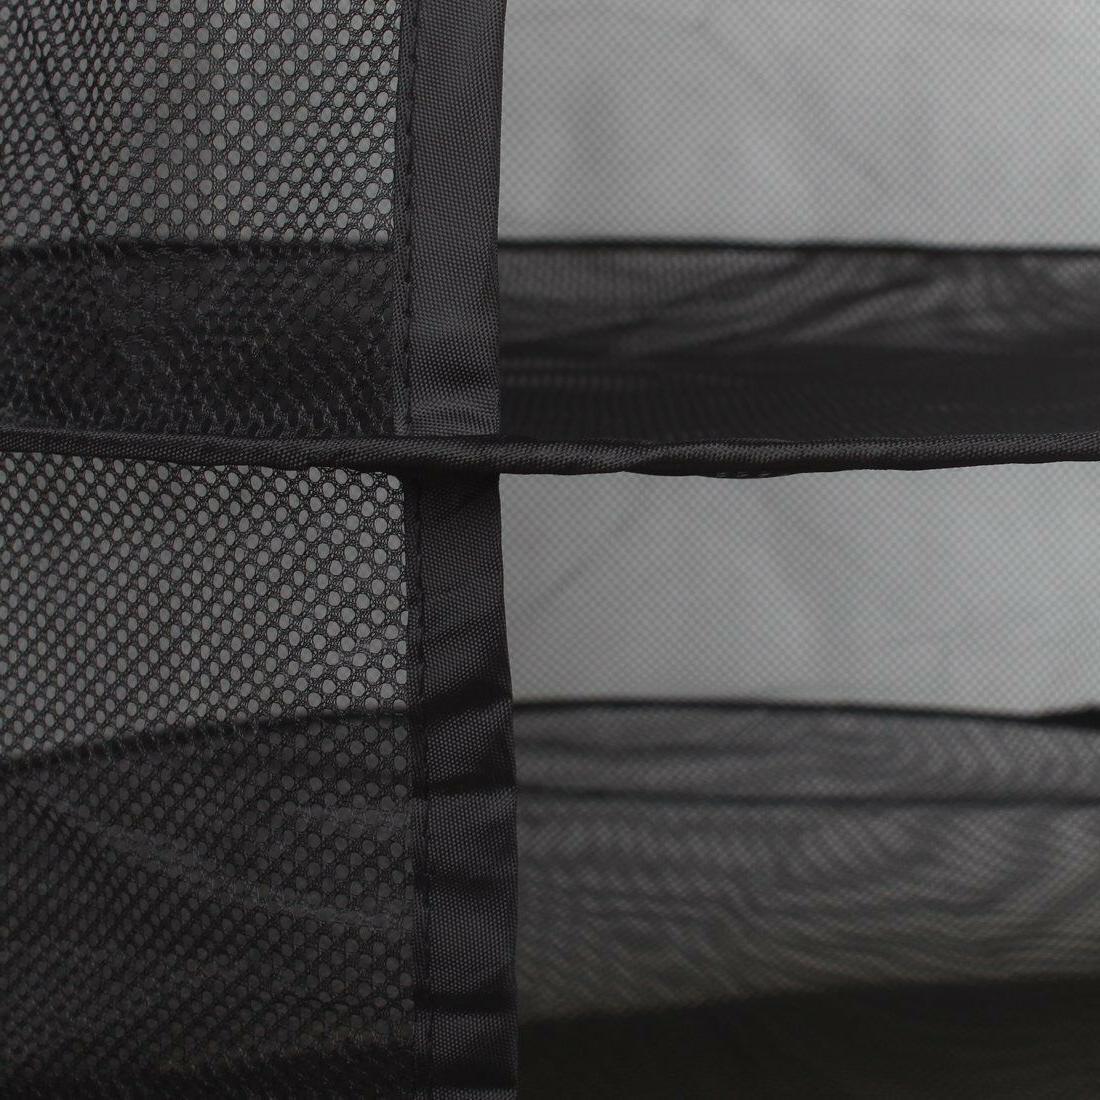 Growsun 8 Hanging Drying Rack Collapible +Scissors